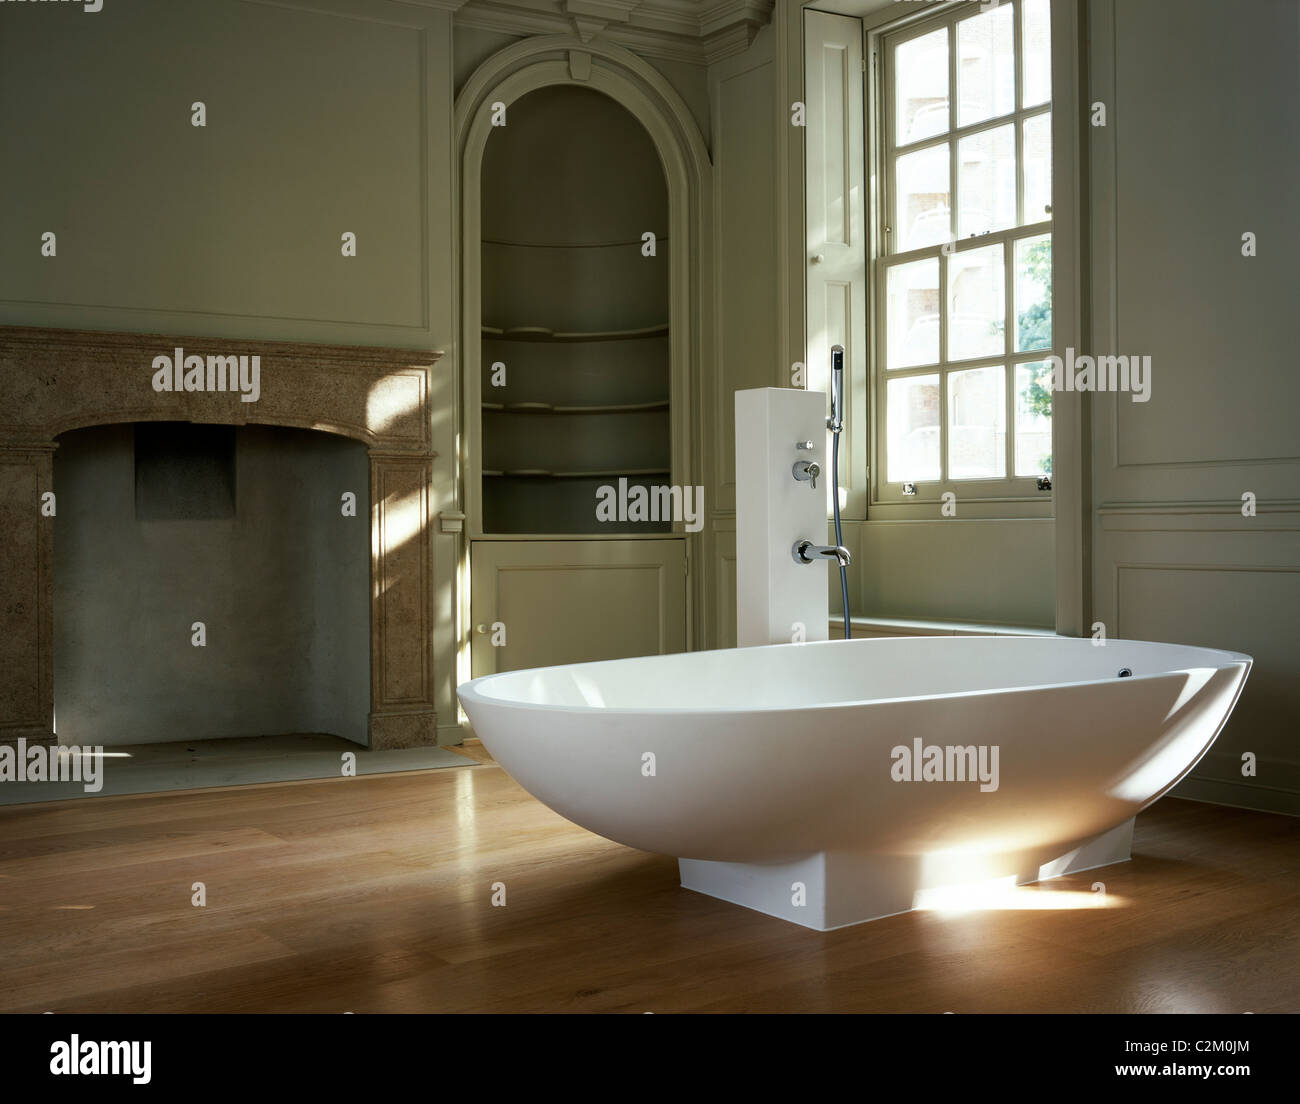 Refurbished house in Belgravia. Bathroom. - Stock Image